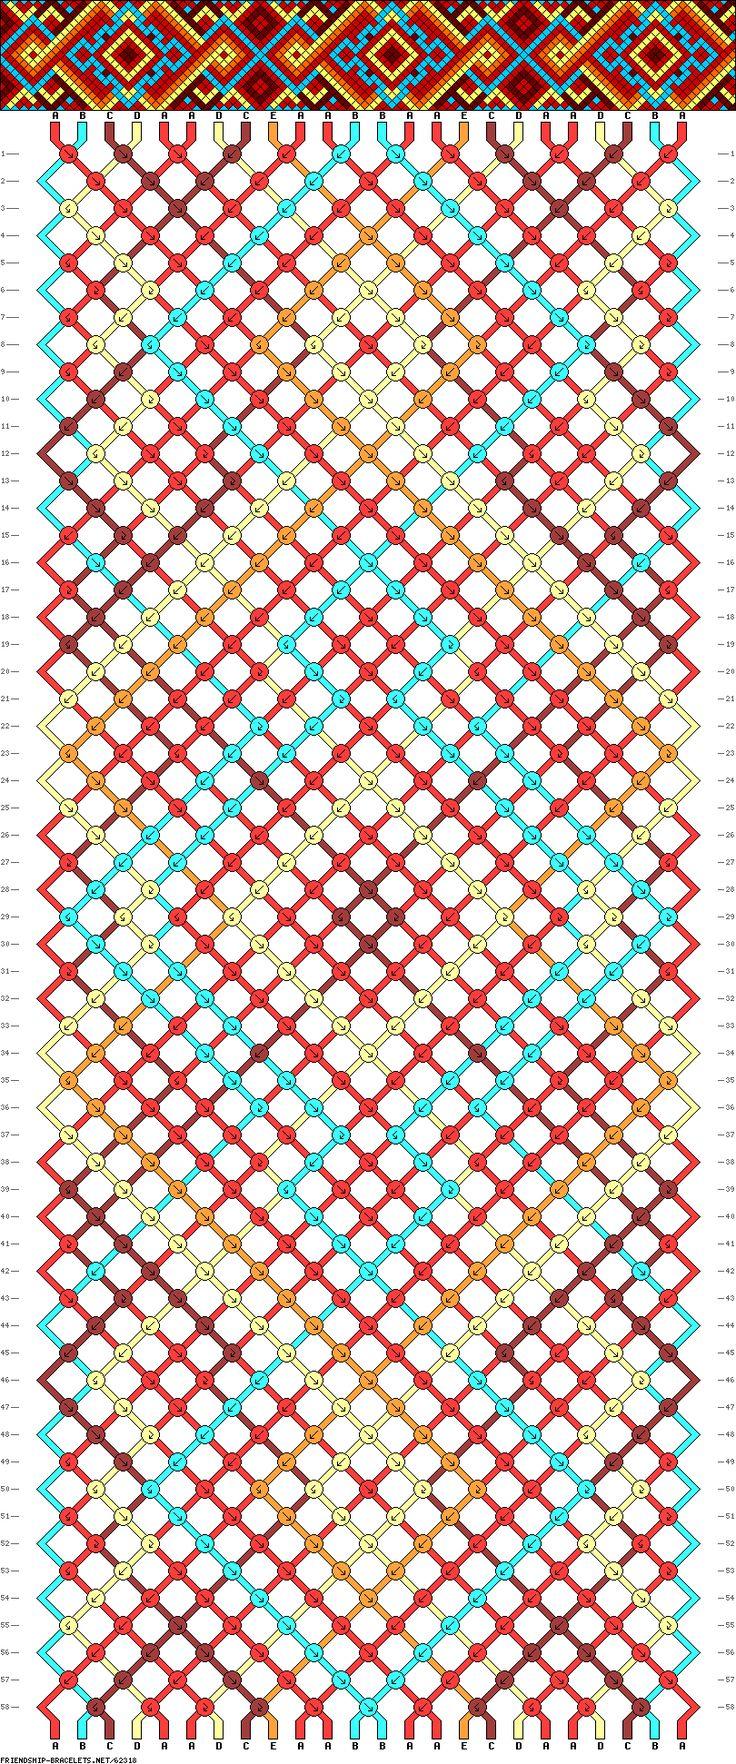 24 strings, 5 colors, 58 rows